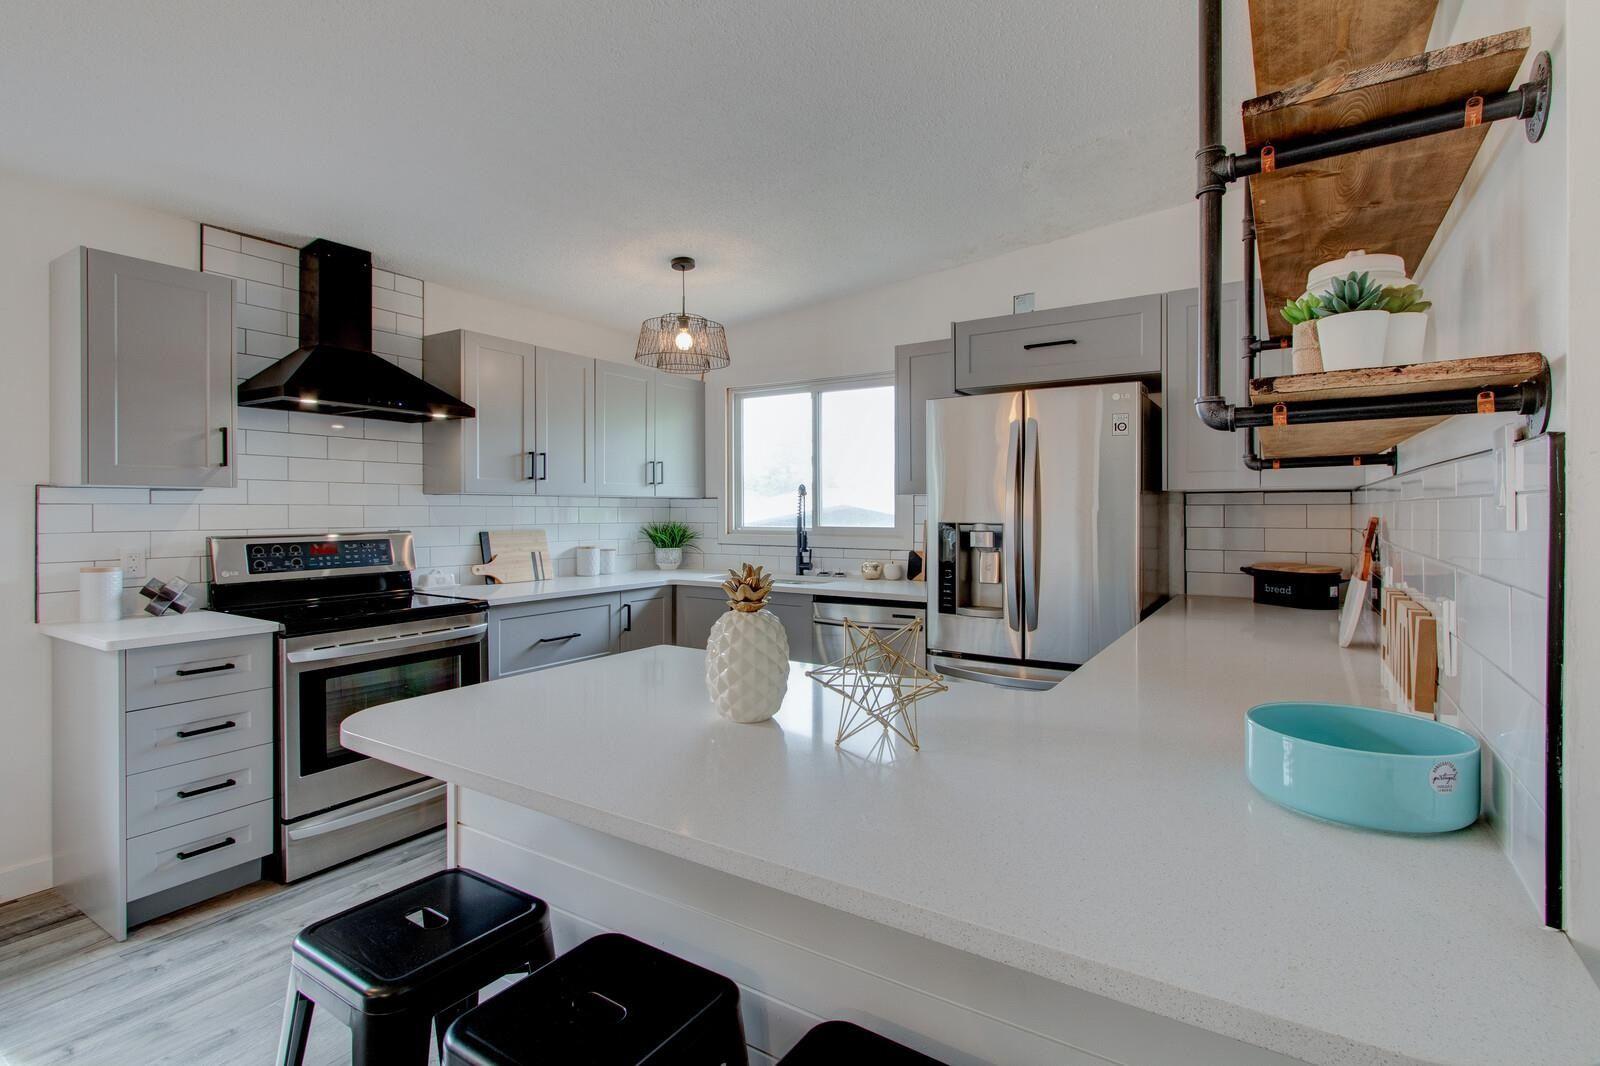 Main Photo: 5711 89 Avenue in Edmonton: Zone 18 House for sale : MLS®# E4247720